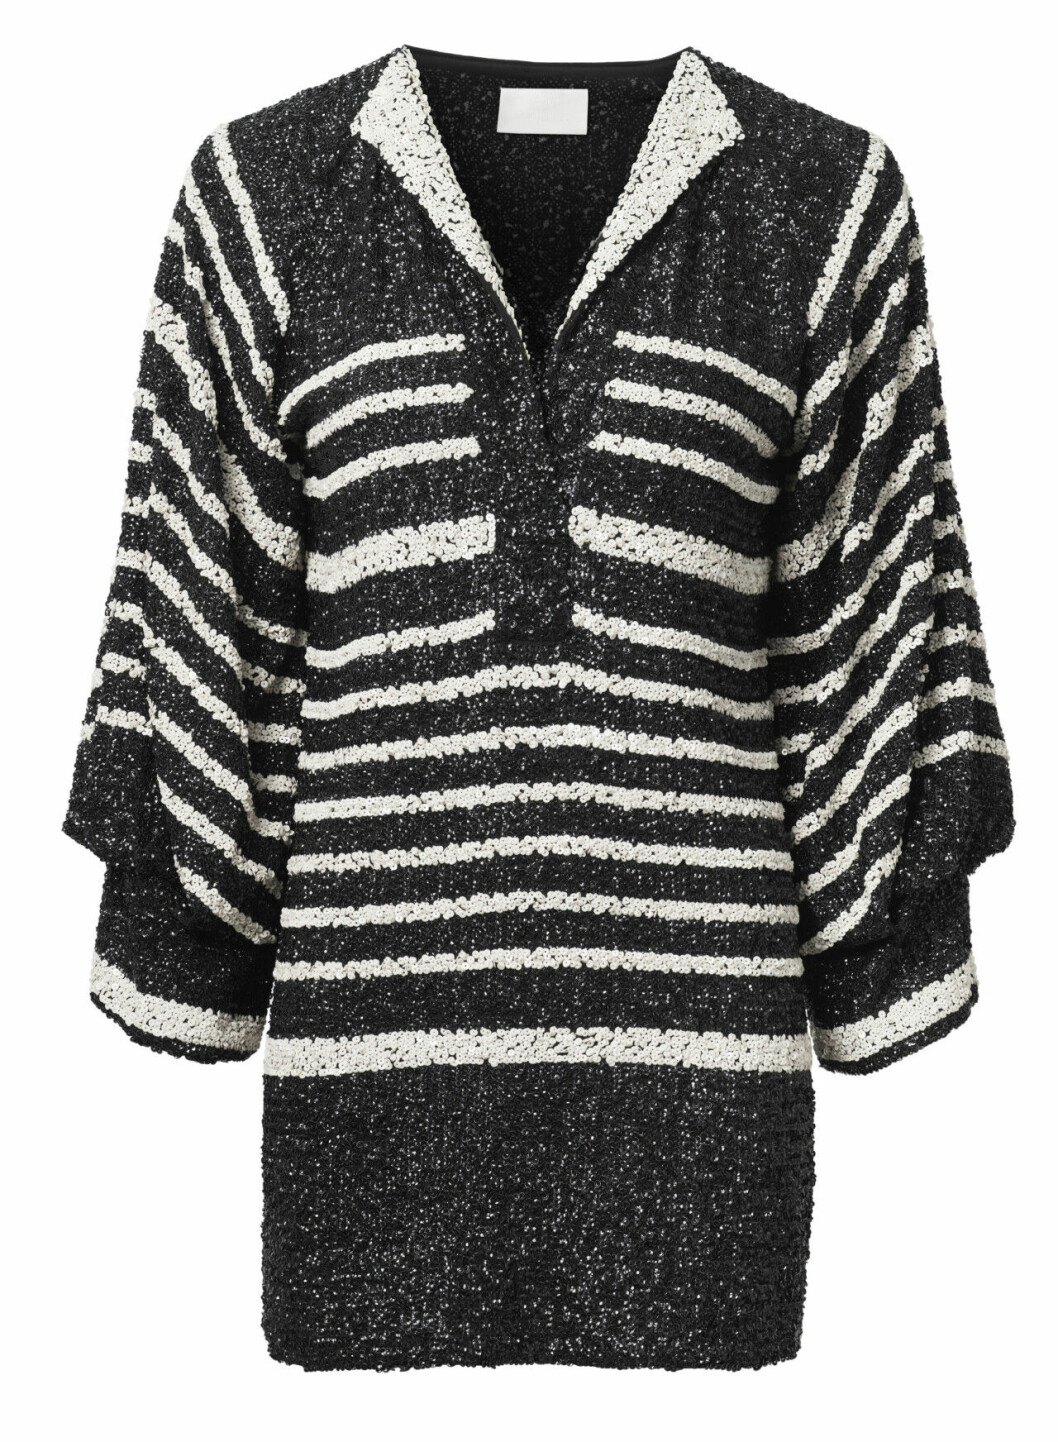 H&M conscious exclusive SS20 – paljettklänning